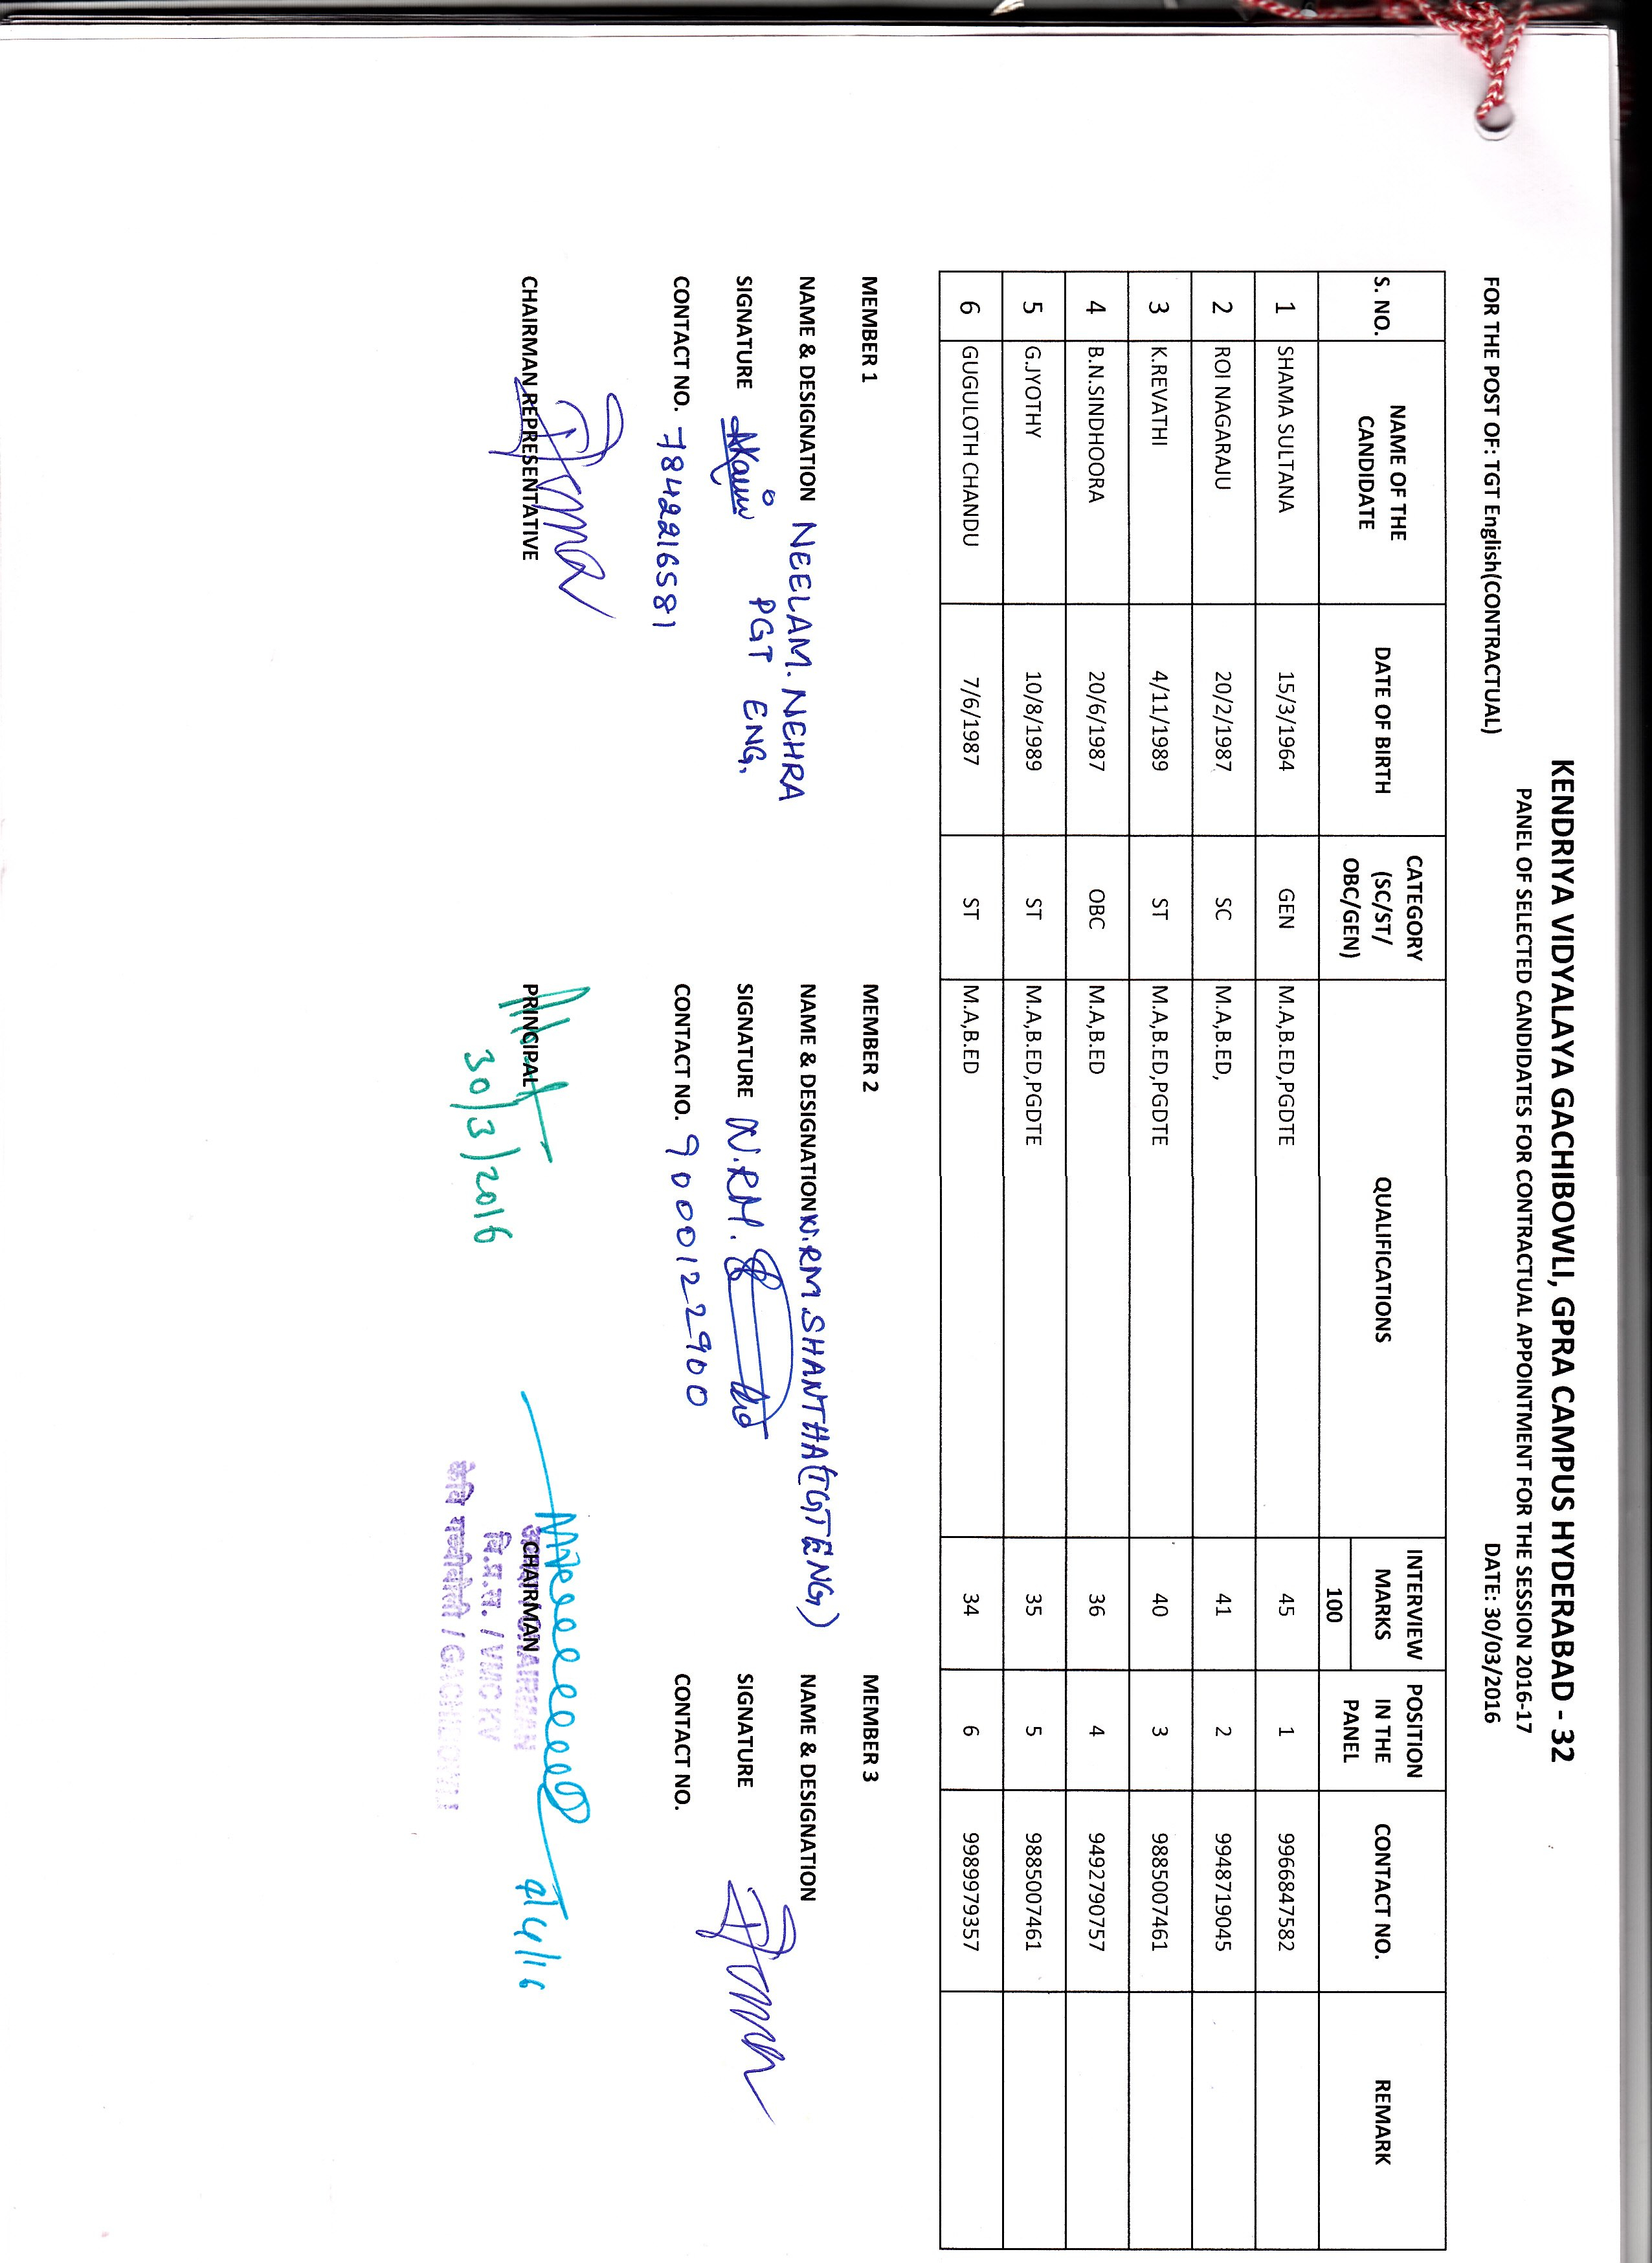 Kendriya Vidyalaya Gachibowli  Home Page Within Super Teacher Worksheets Username And Password 2016 2017